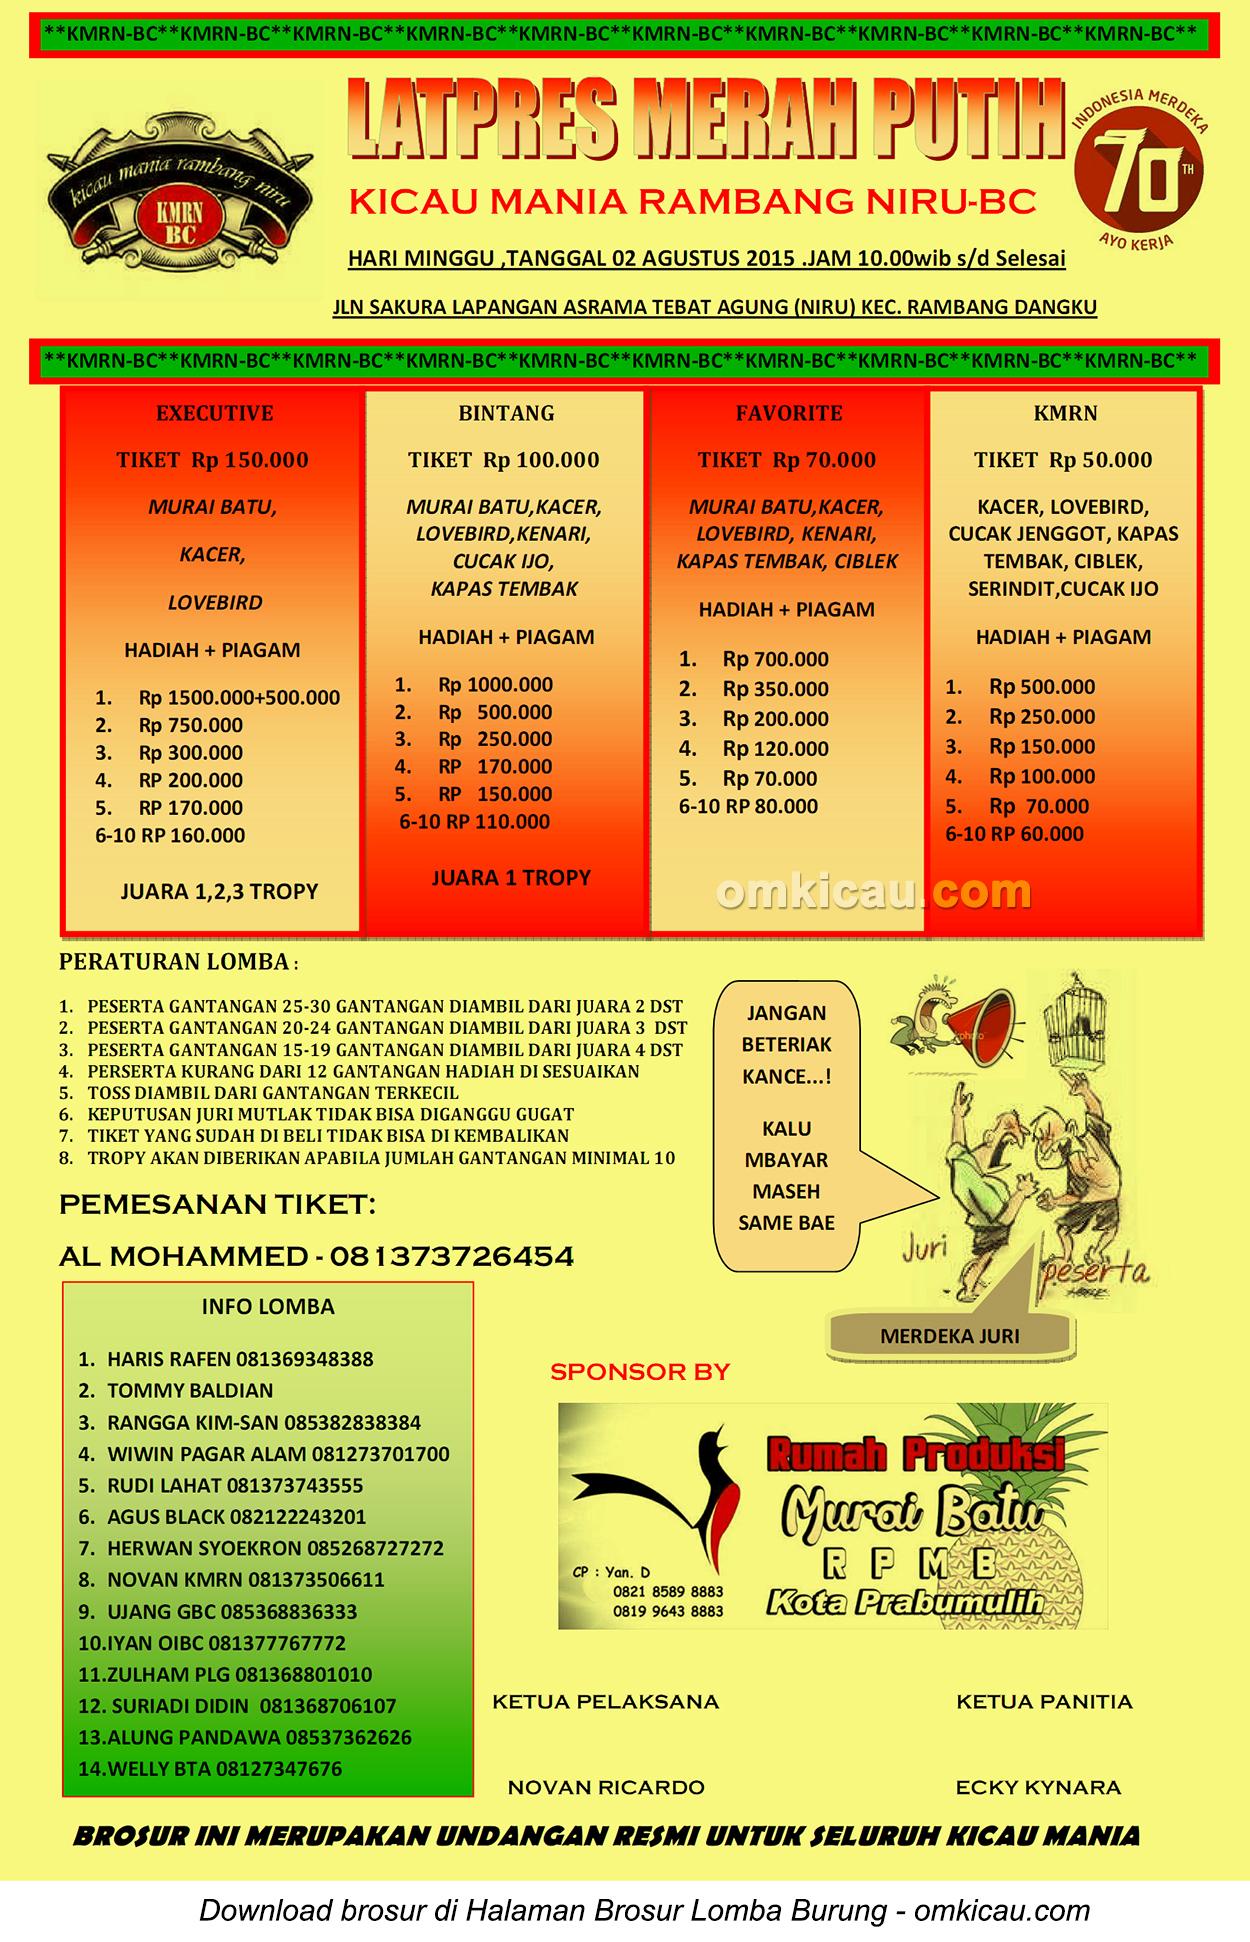 Brosur Latpres Merah Putih KMRN-BC, Muara Enim, 2 Agustus 2015